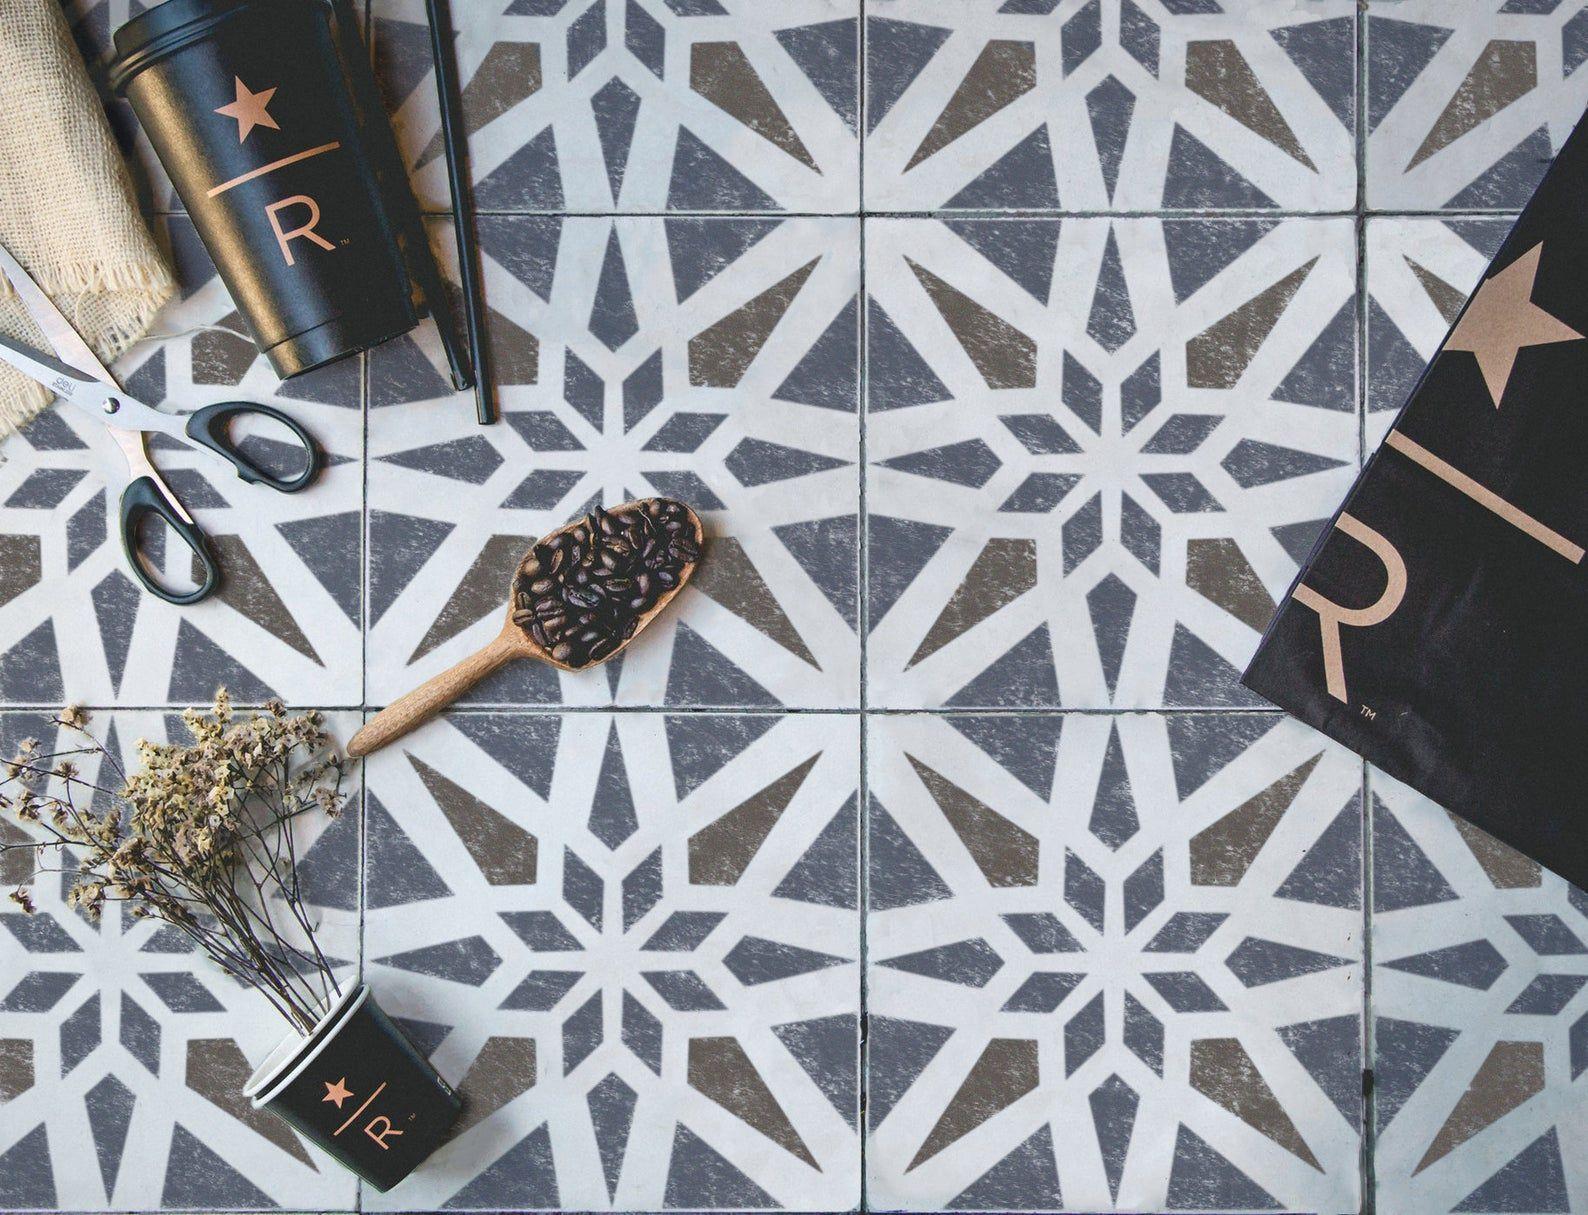 Modern Geometric Tile Stencil Tile Stencils Floor Wall